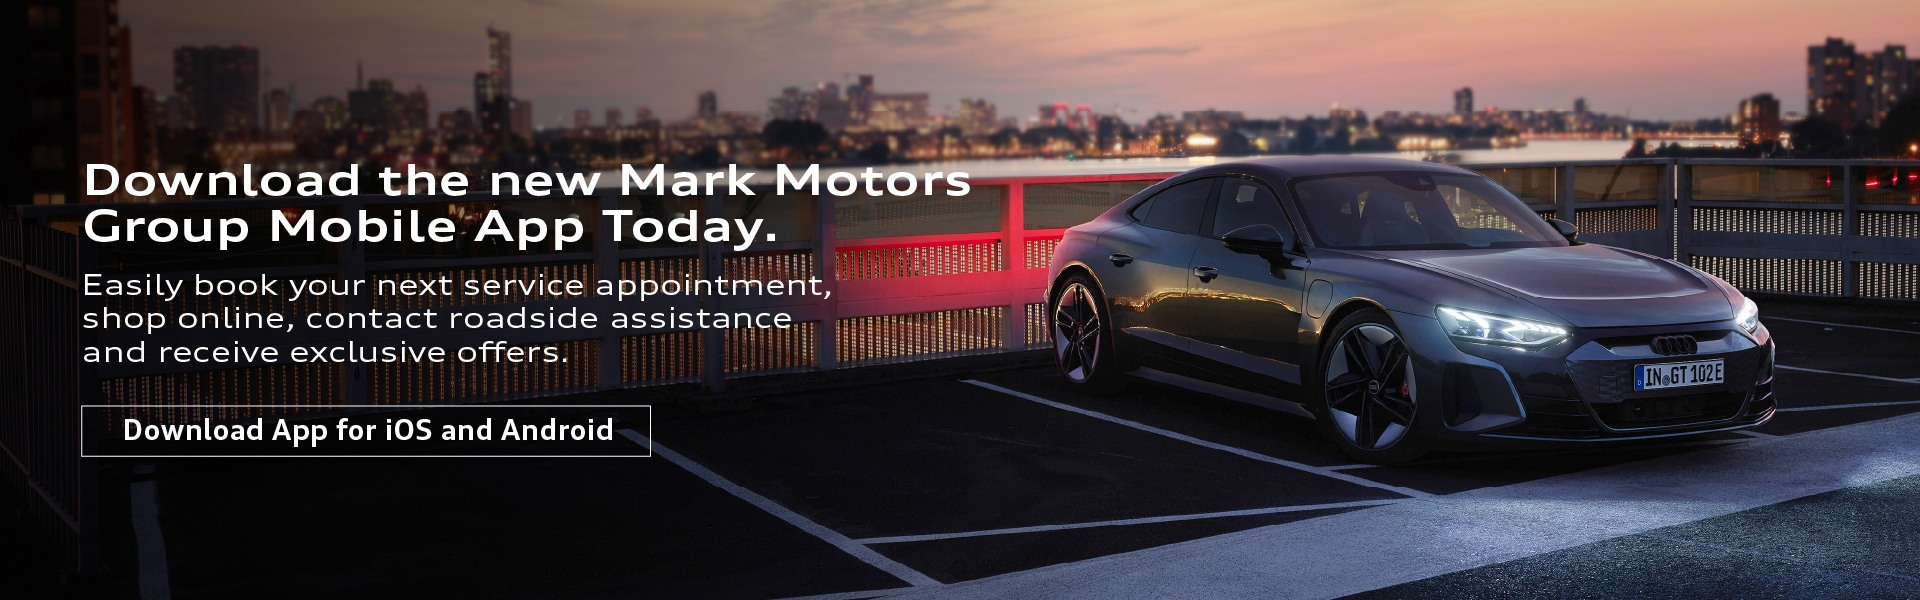 Mark Motors Group Mobile App Promotional Banner